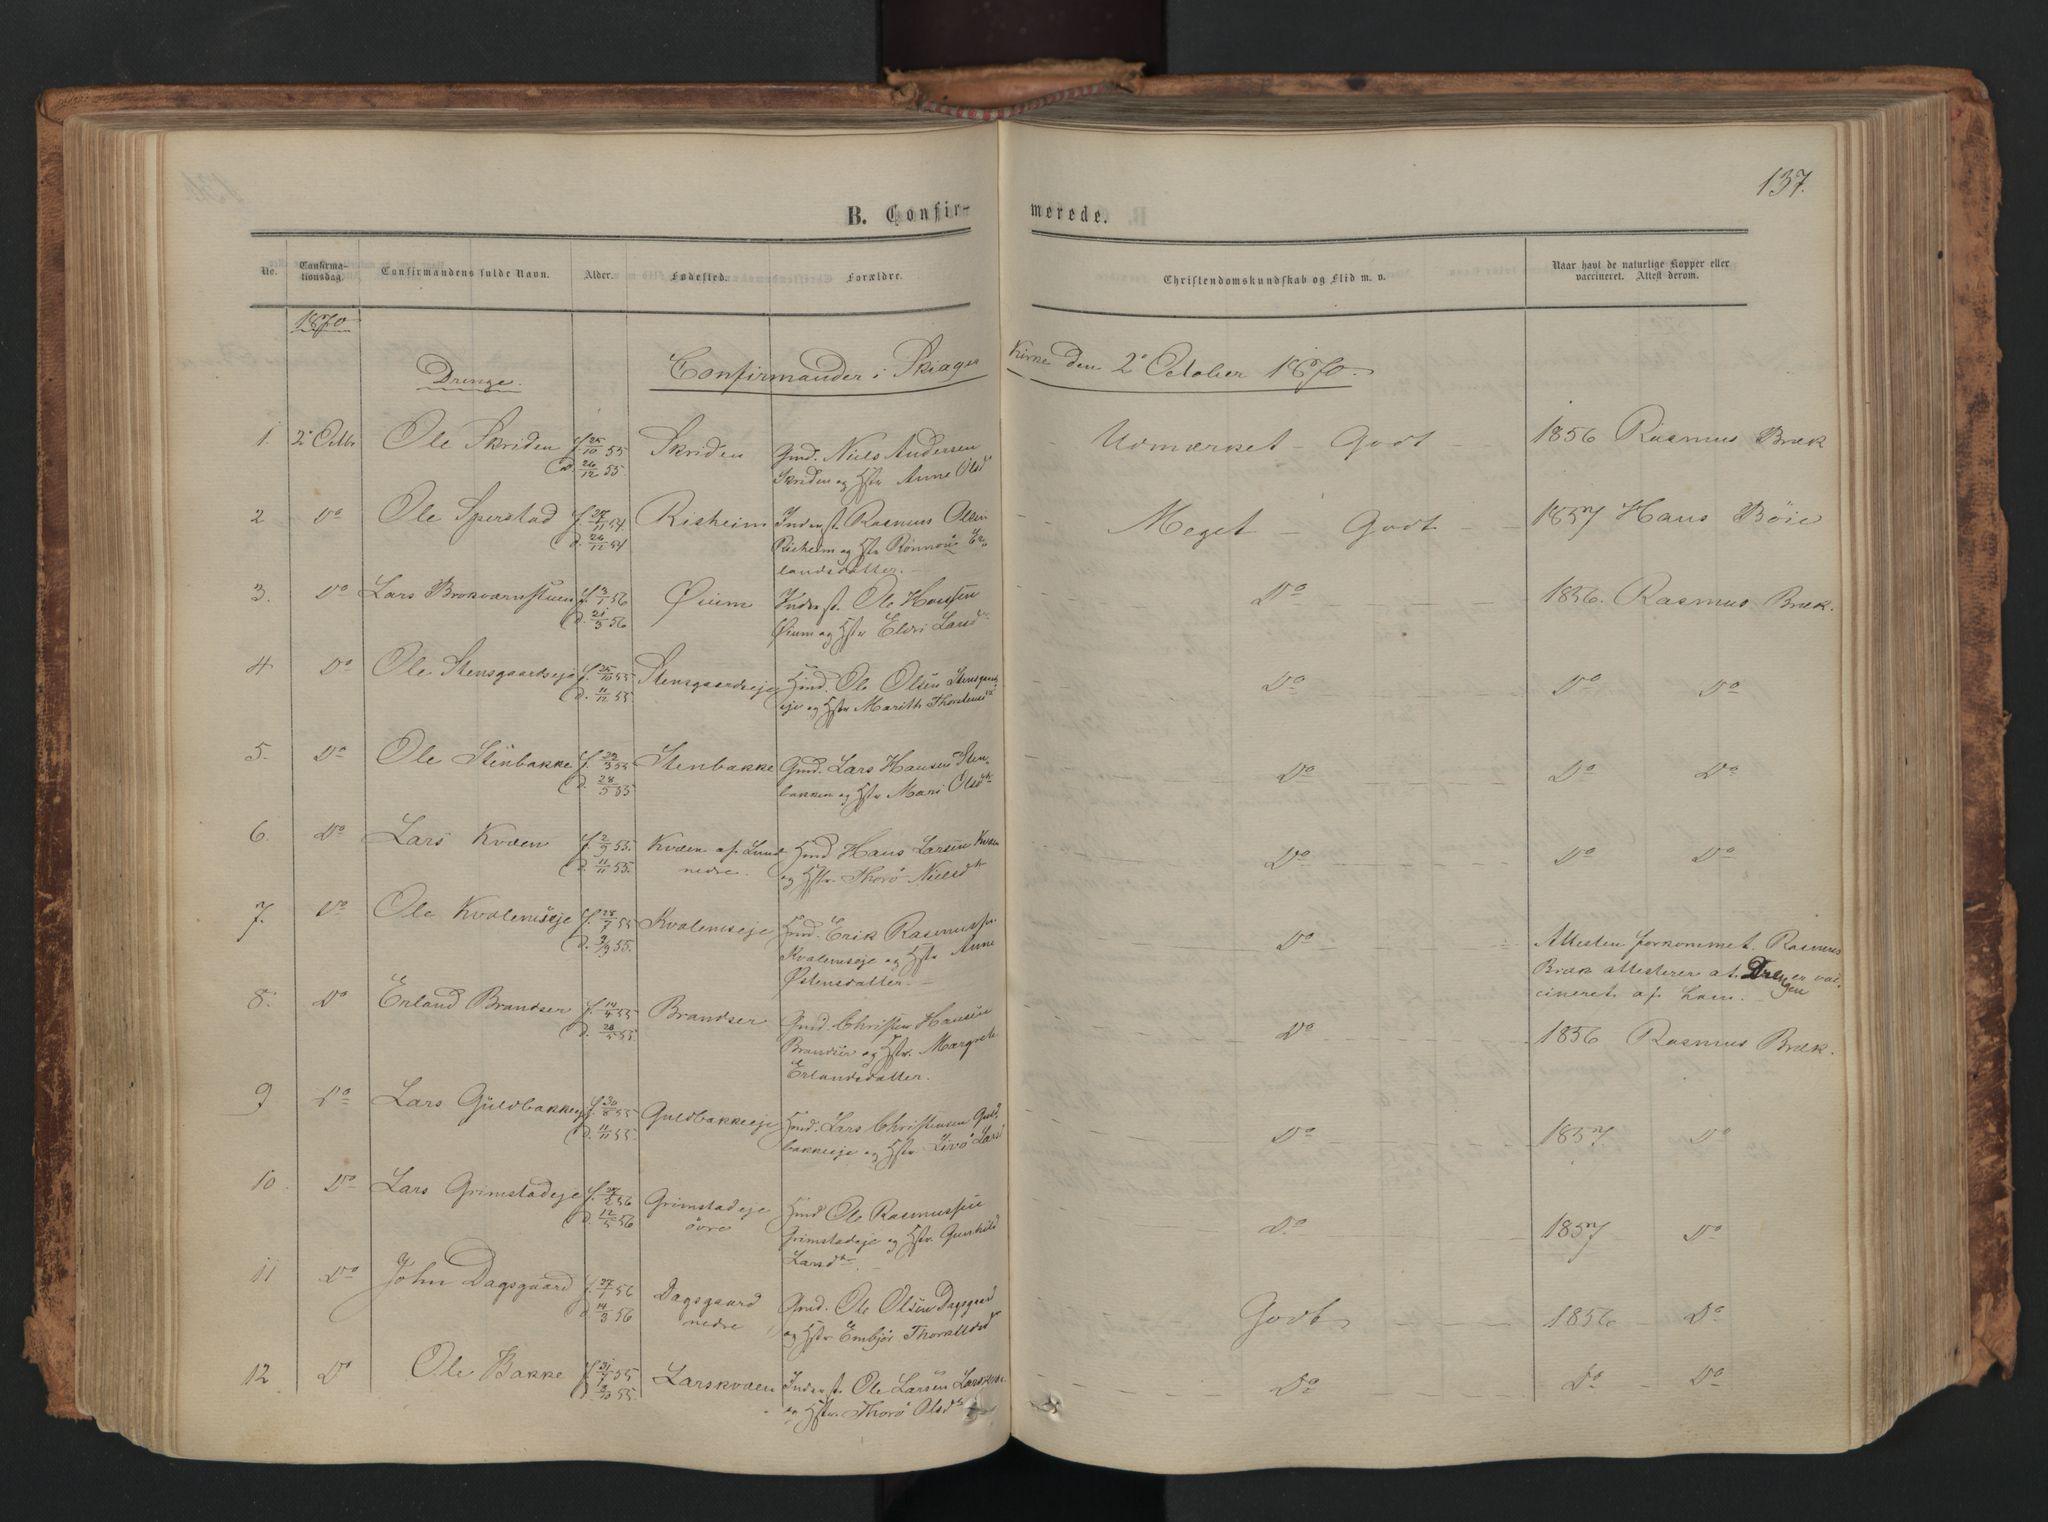 SAH, Skjåk prestekontor, Ministerialbok nr. 1, 1863-1879, s. 137